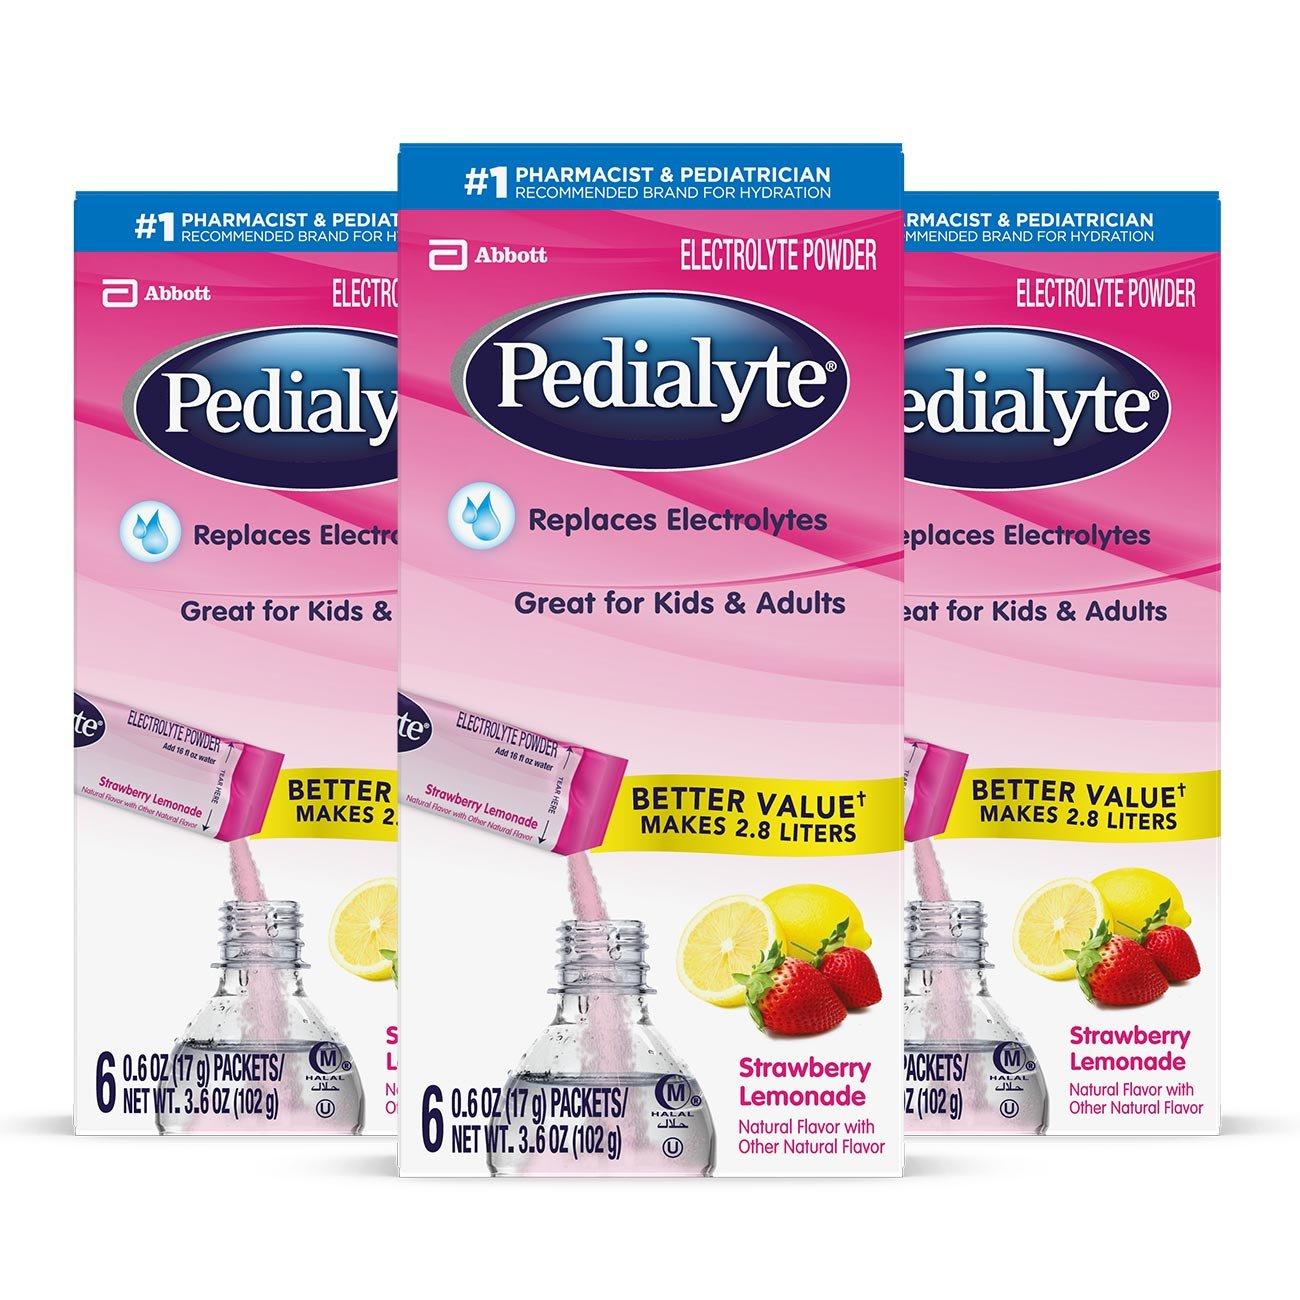 Pedialyte Electrolyte Powder, Grape, Electrolyte Hydration Drink, 0.6 oz Powder Packs, 18 Count Abbott Laboratories 070074662640